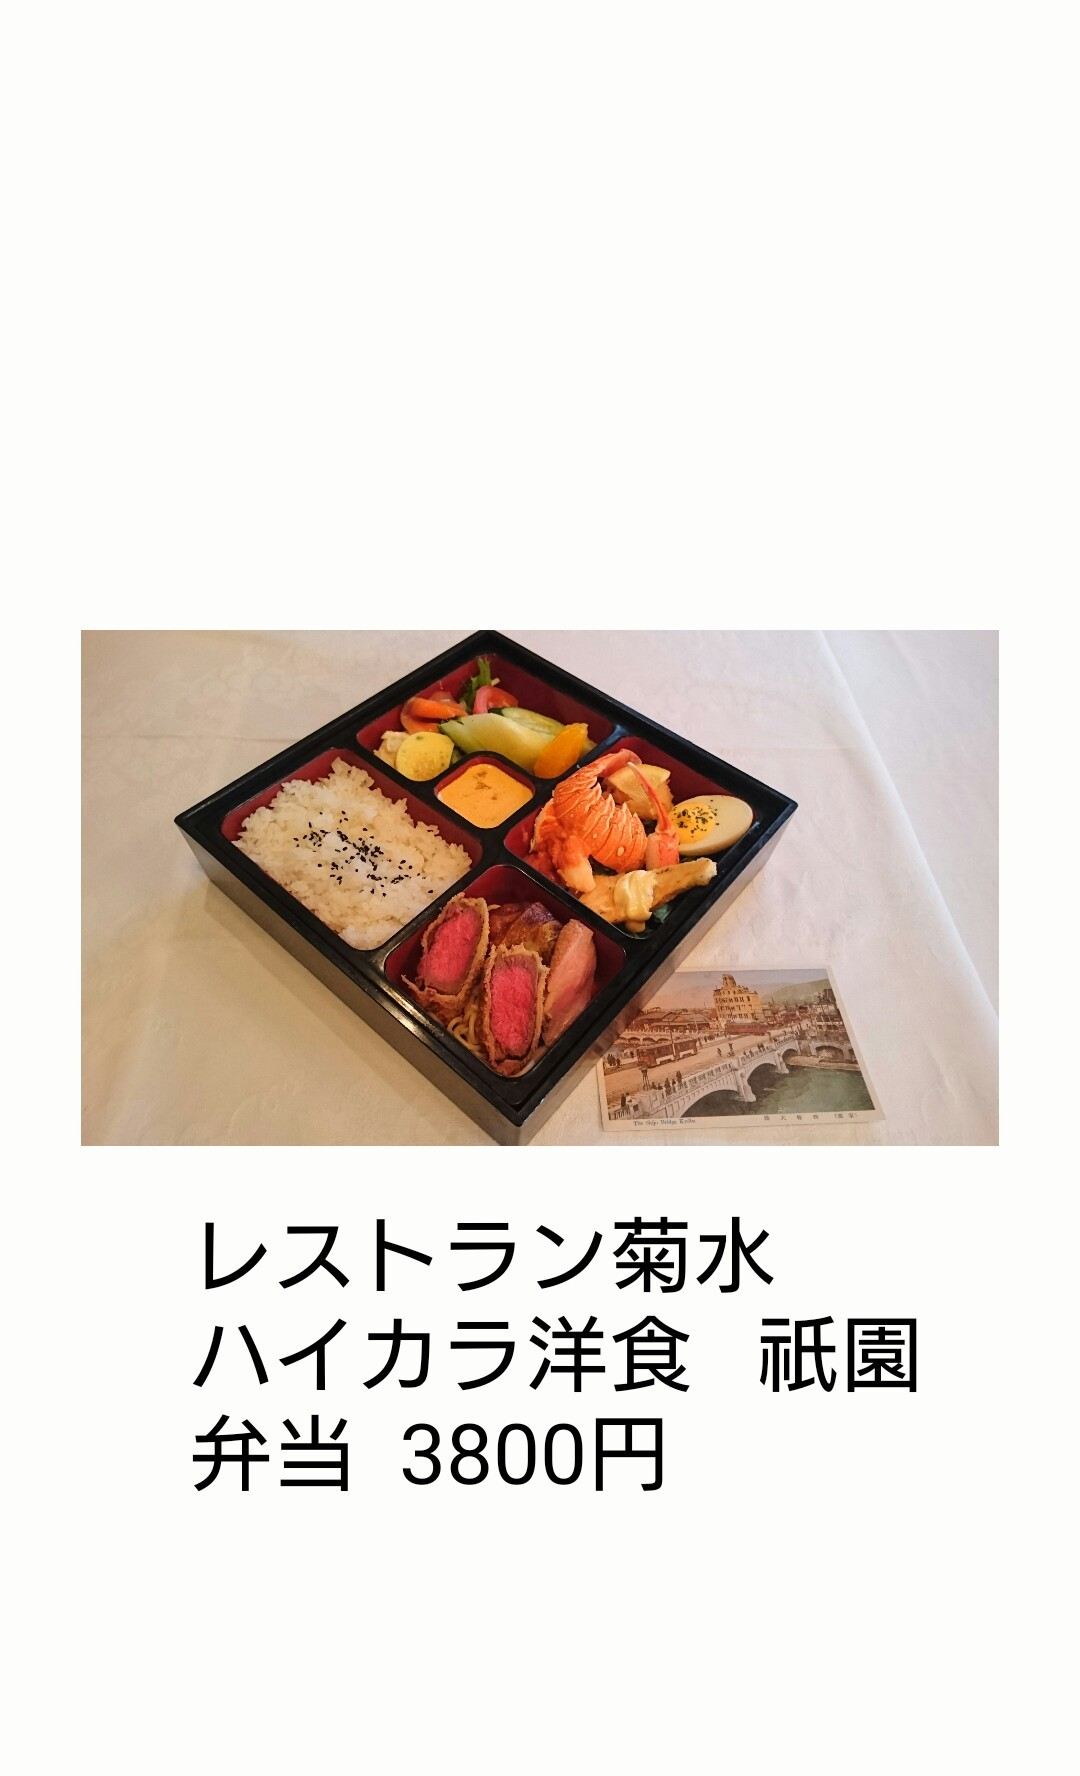 ROHM シアター 顔見世興行観劇弁当 レストラン菊水    _d0162300_12392542.jpg